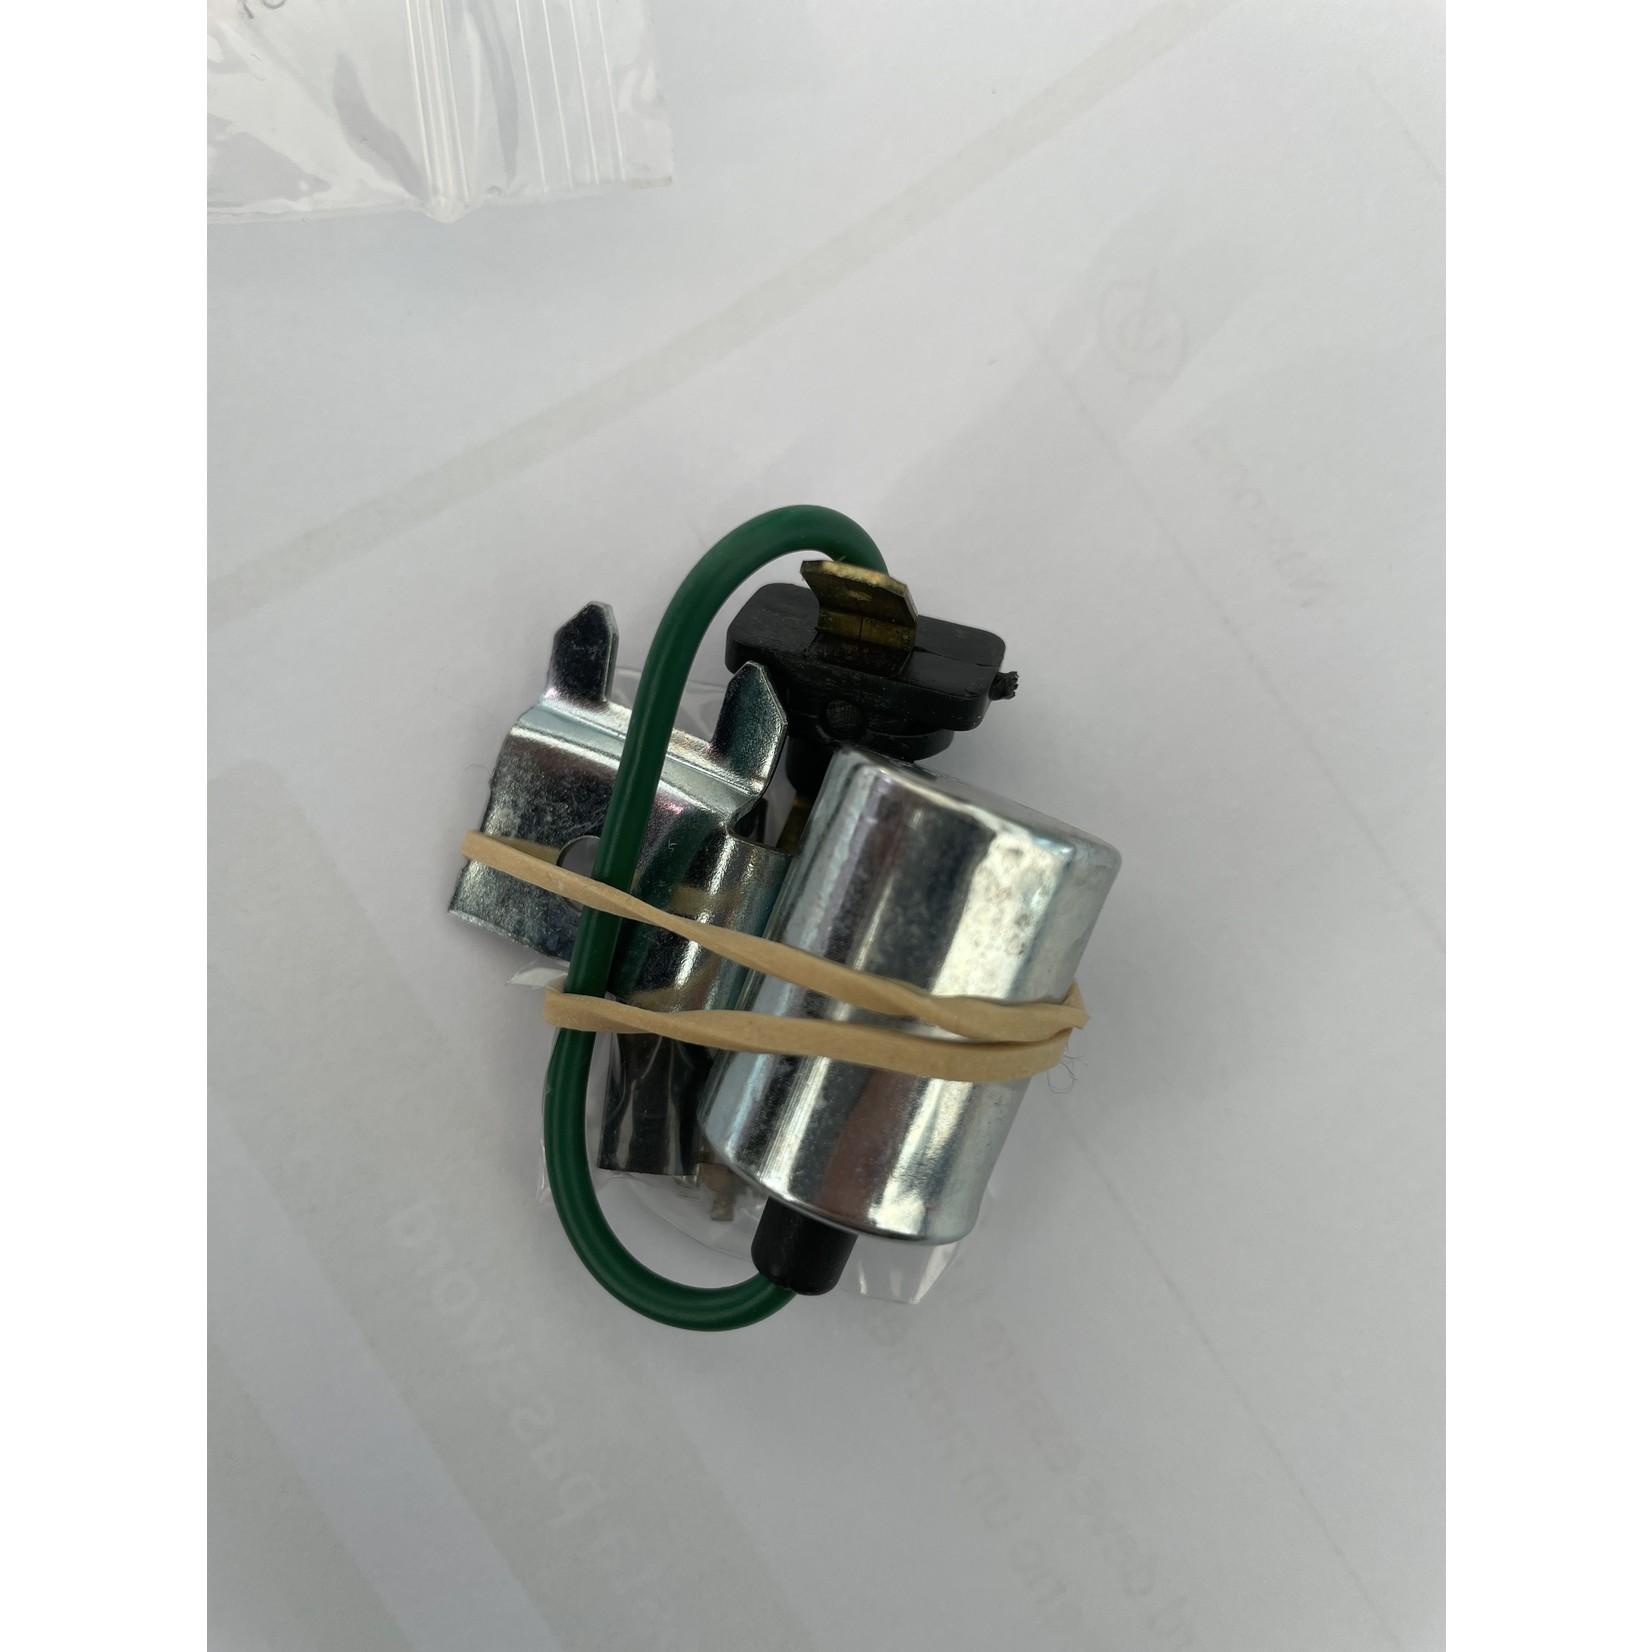 Condensator Bosch Nr Org: DX211208A